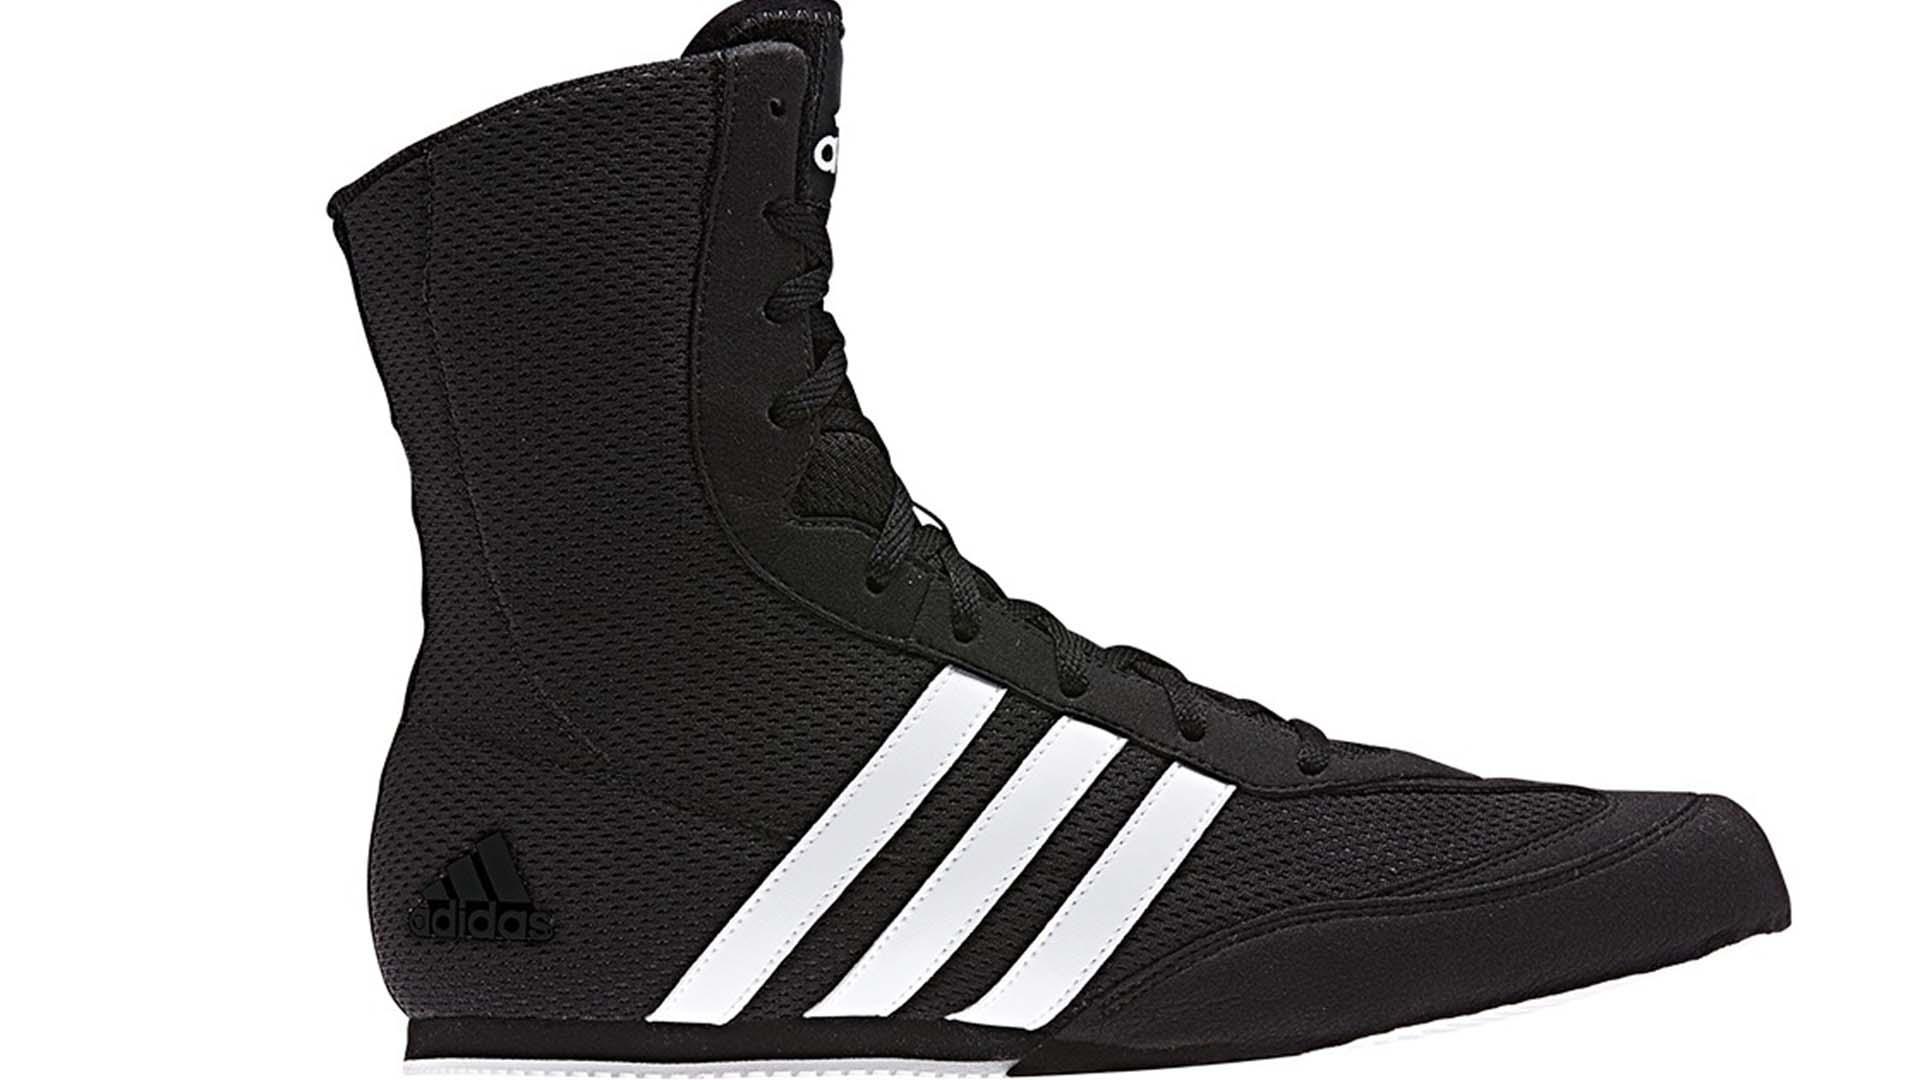 Adidas Box Hog 2 boots